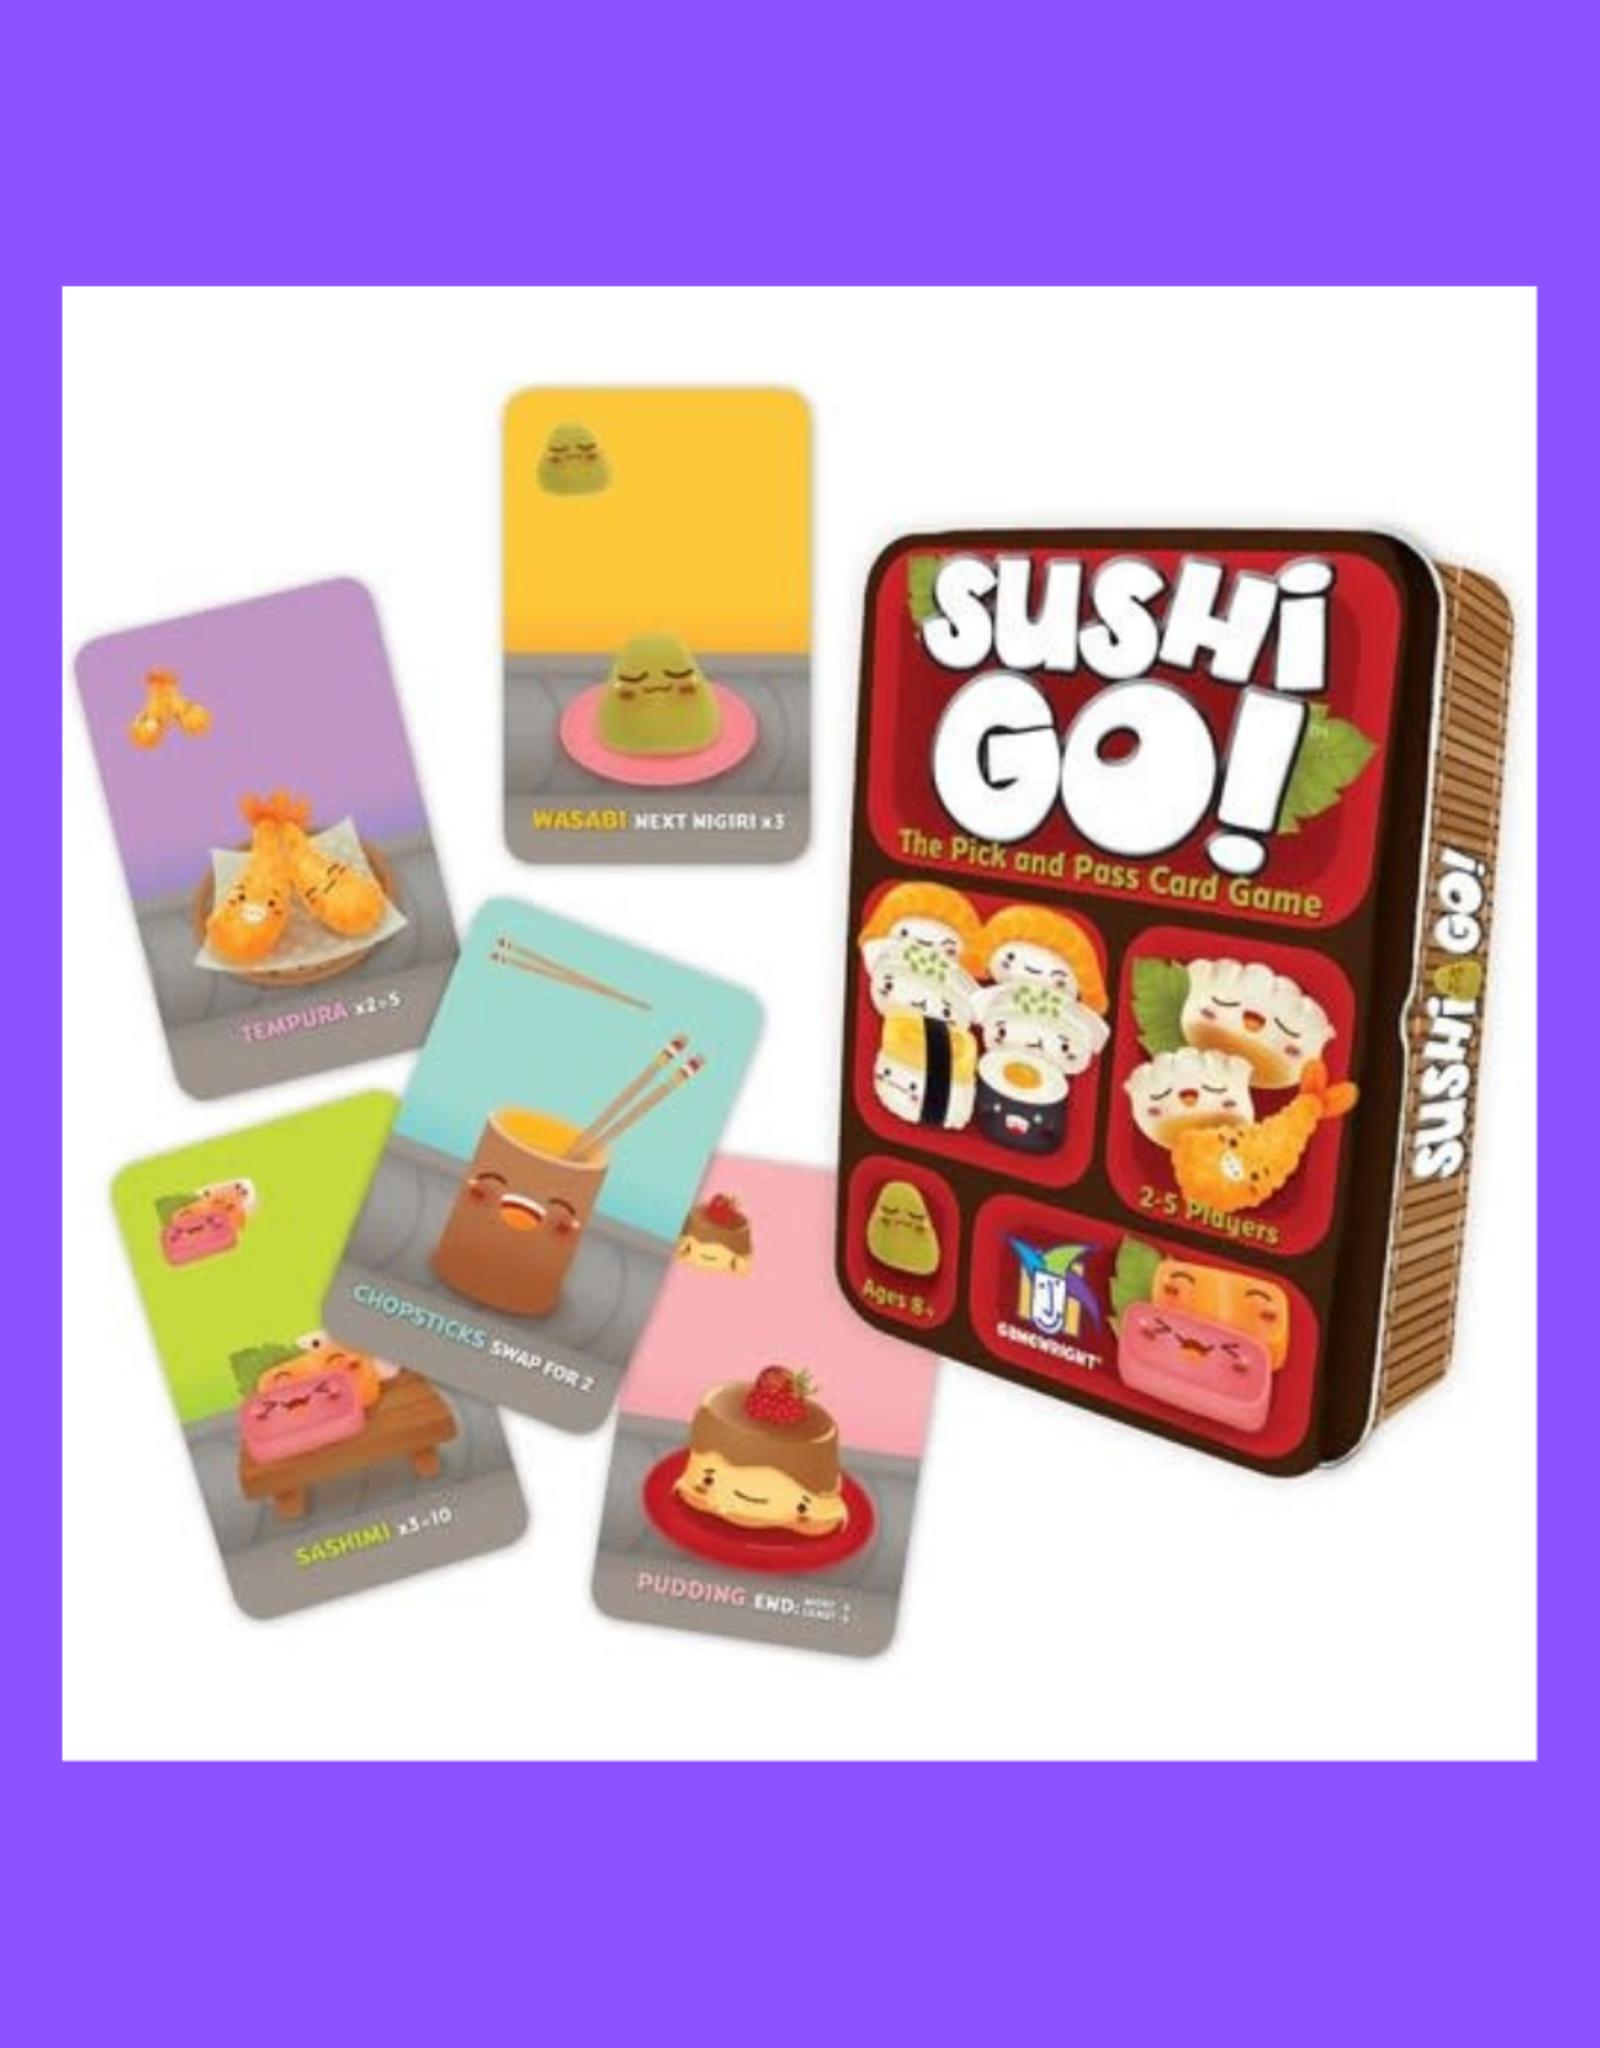 CARD GAME SUSHI GO